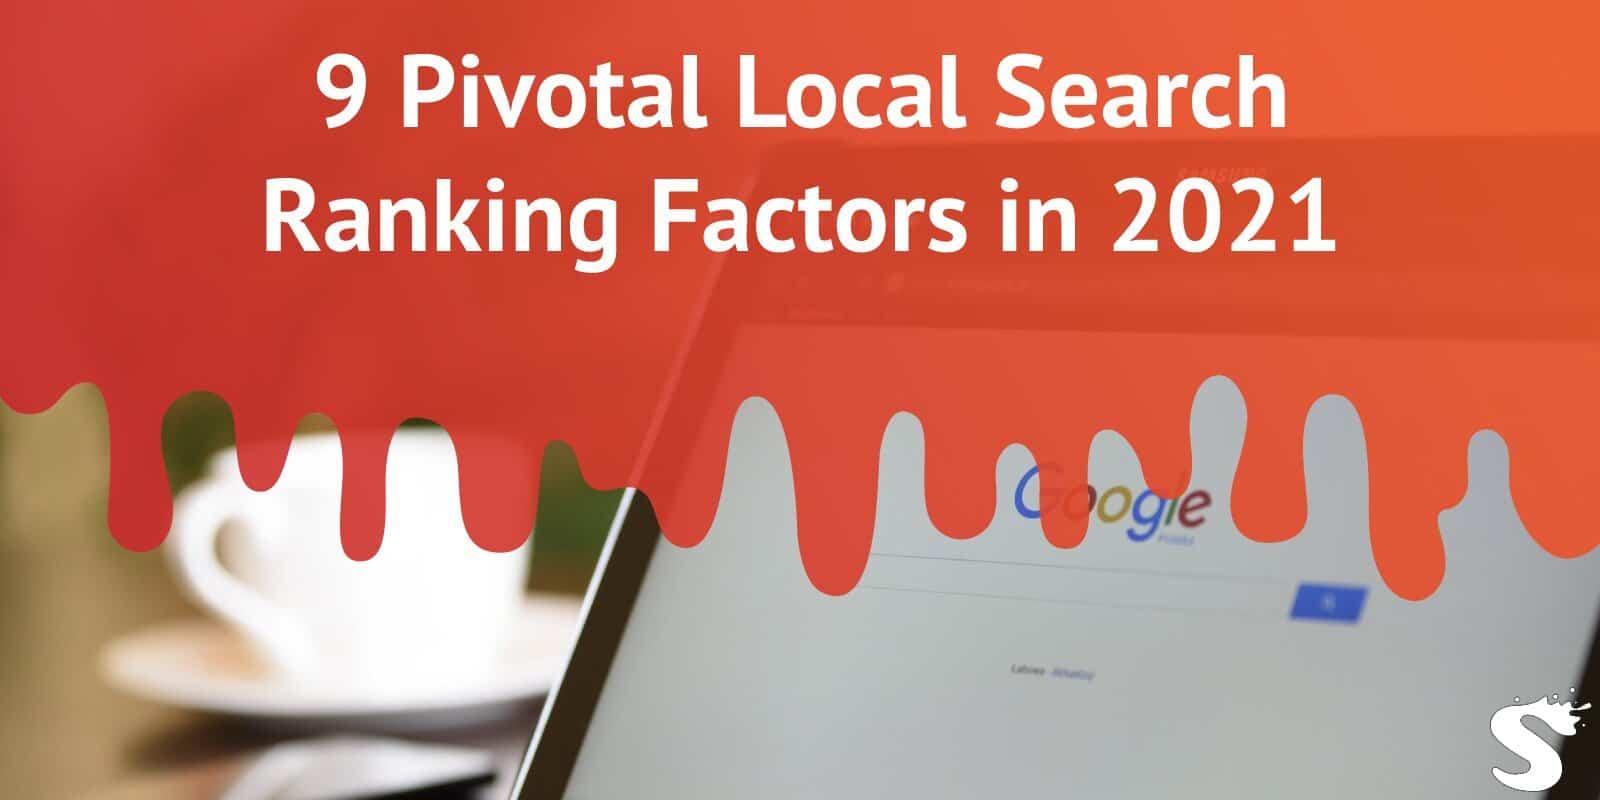 9 Pivotal Local Search Ranking Factors in 2021